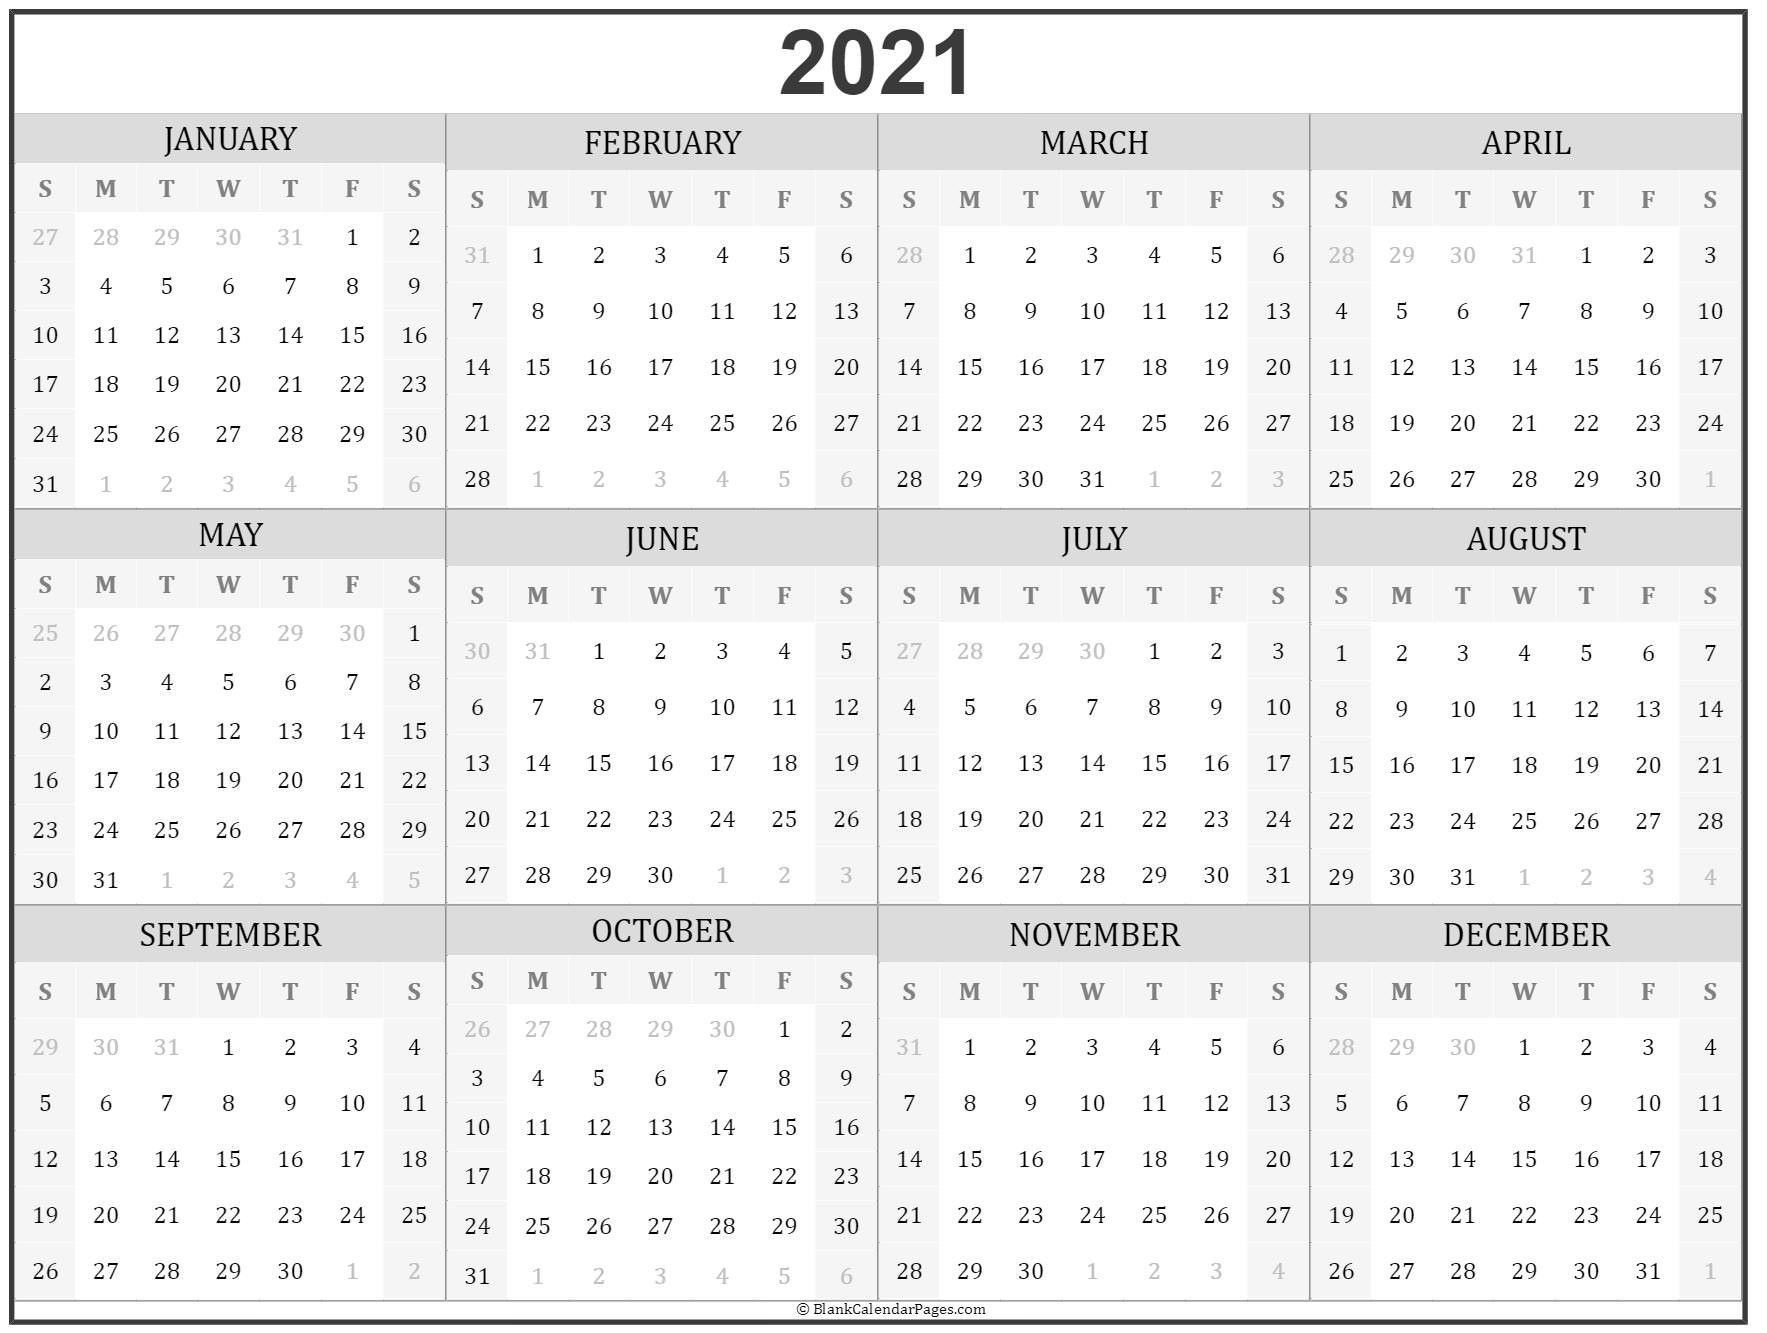 Microsoft Calendar Templates 2021 2 Page Per Month-2021 Calendar Fillable